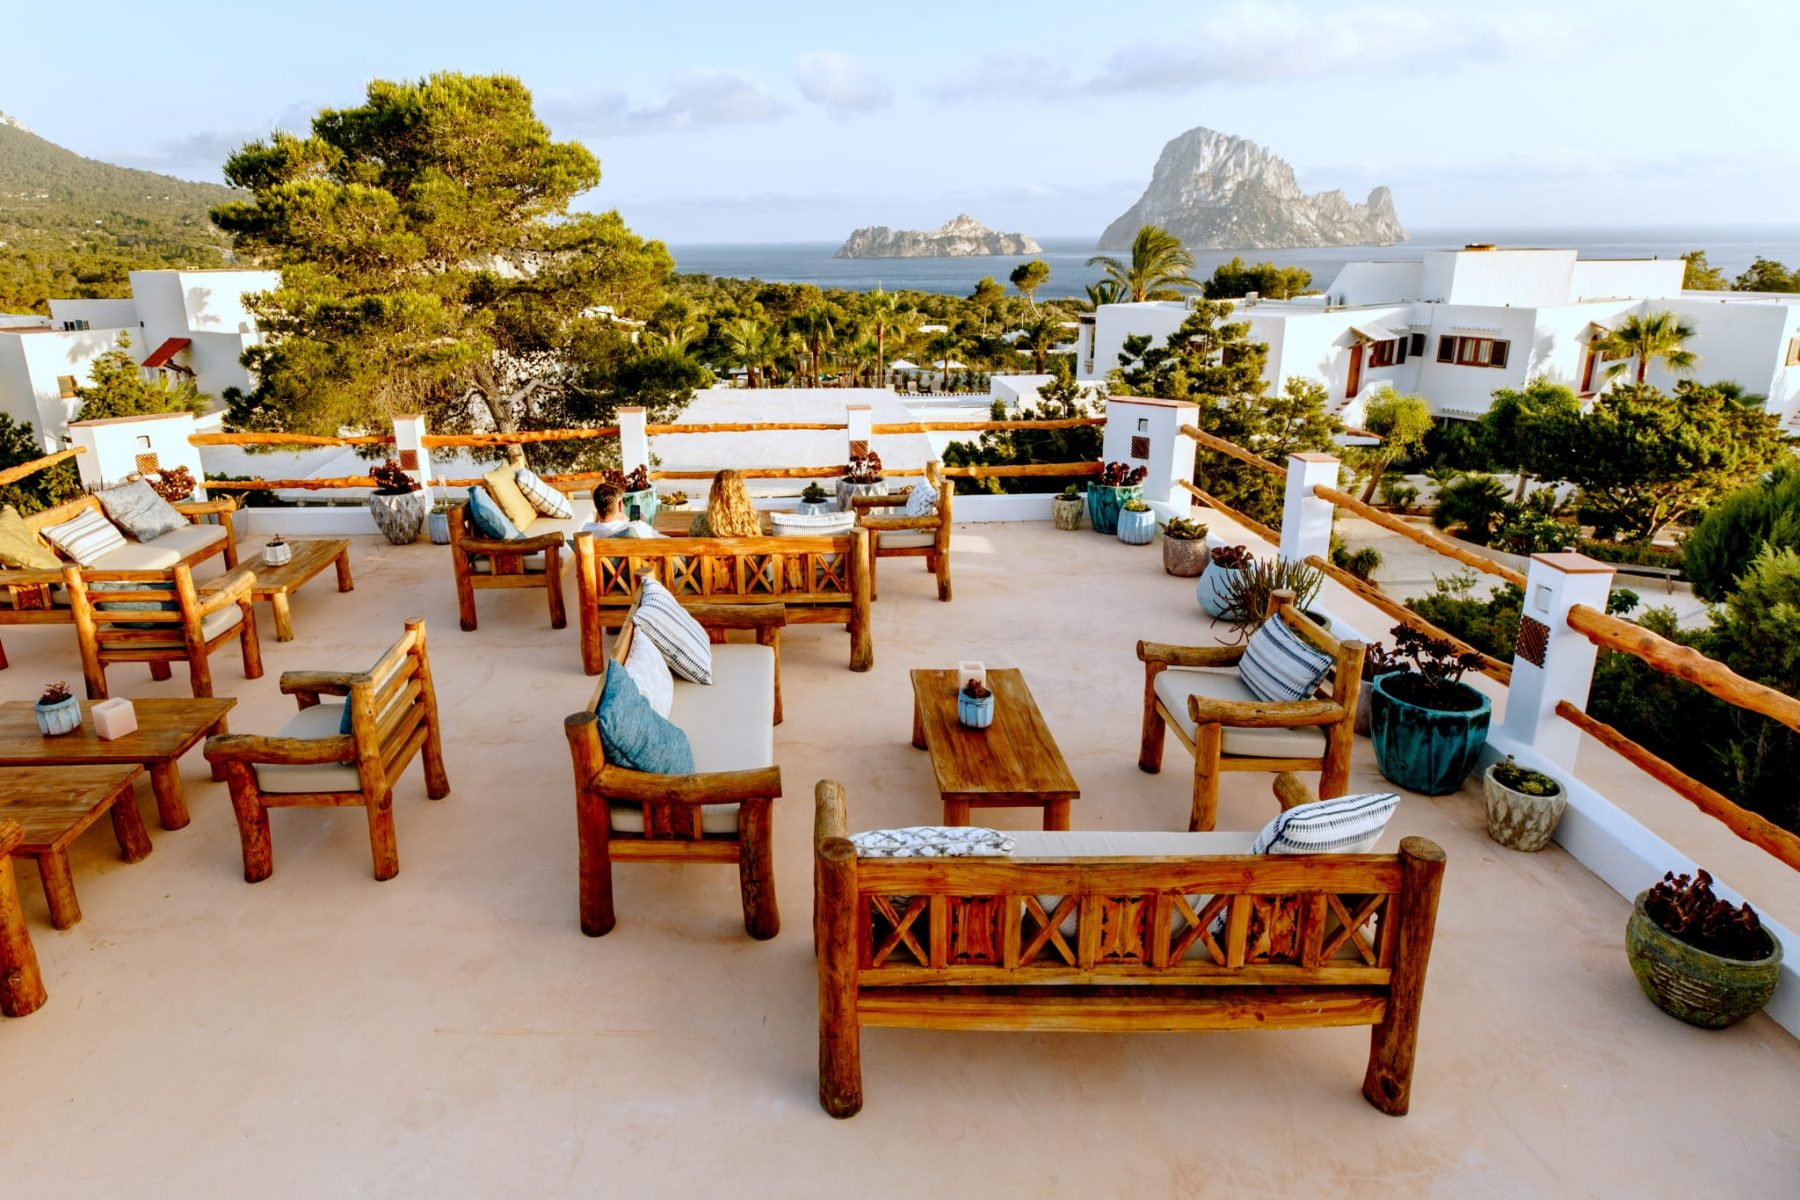 Petunia Hotels in Ibiza